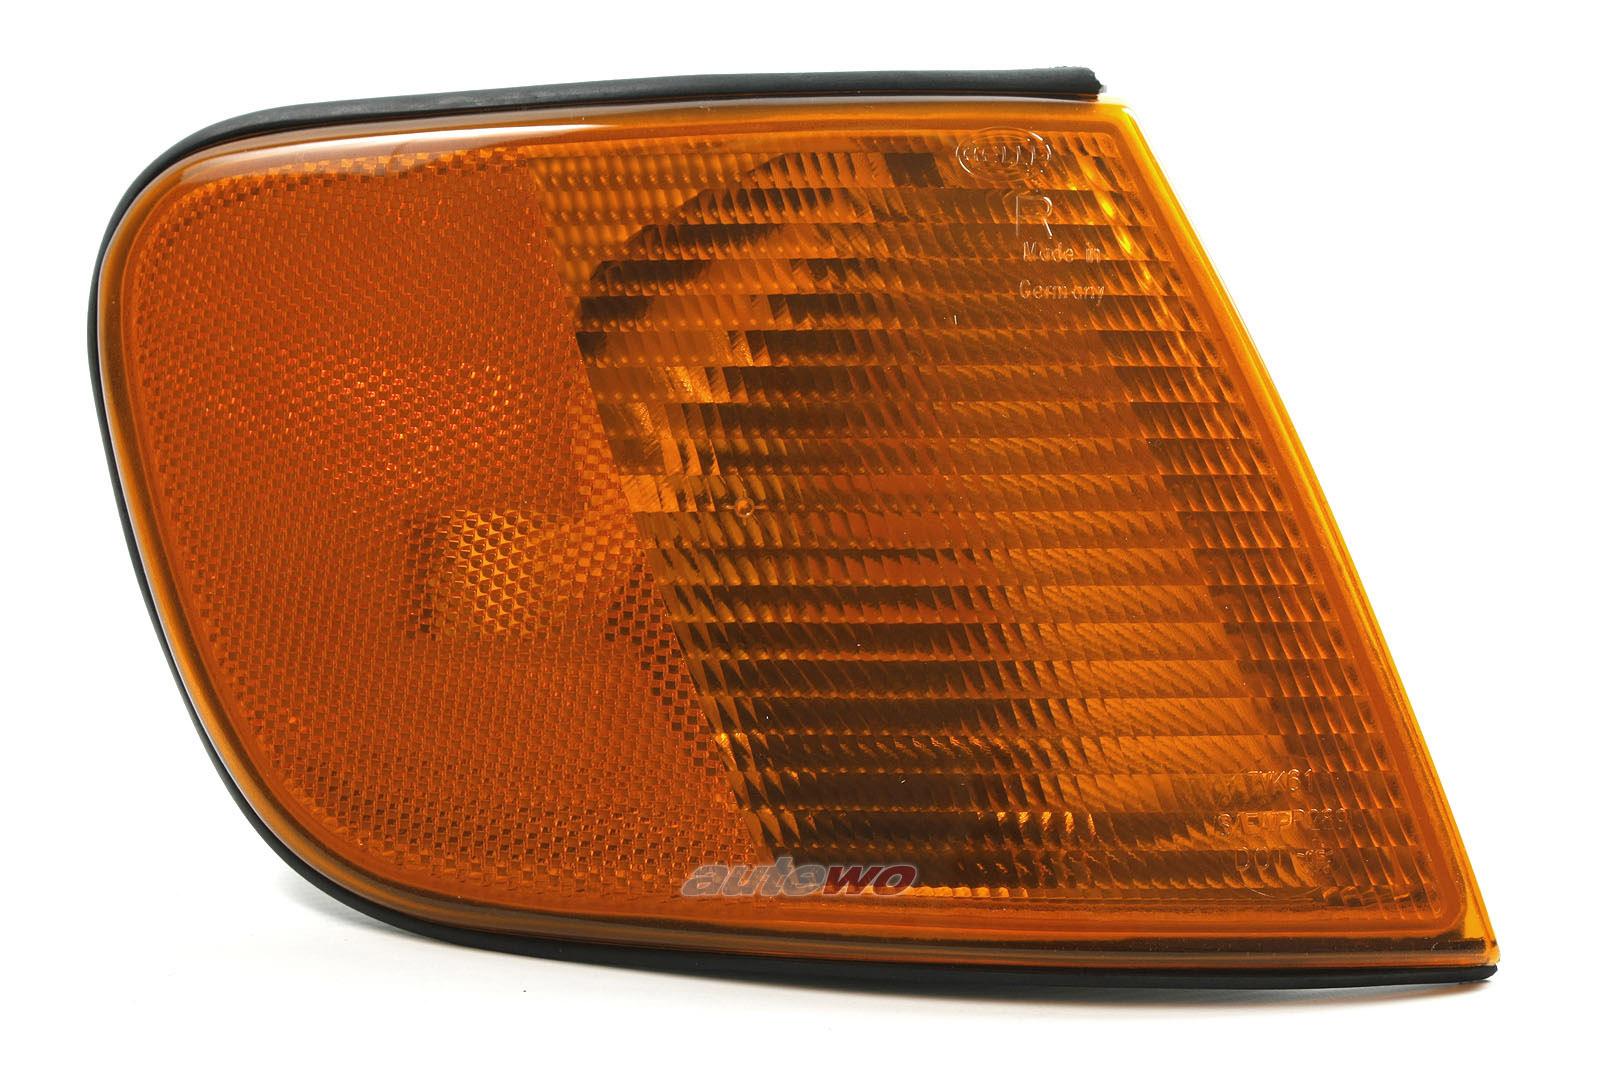 4A0953050C NEU Audi 100 C4 US-Blinker mit Sidemarker Vorne Rechts orange